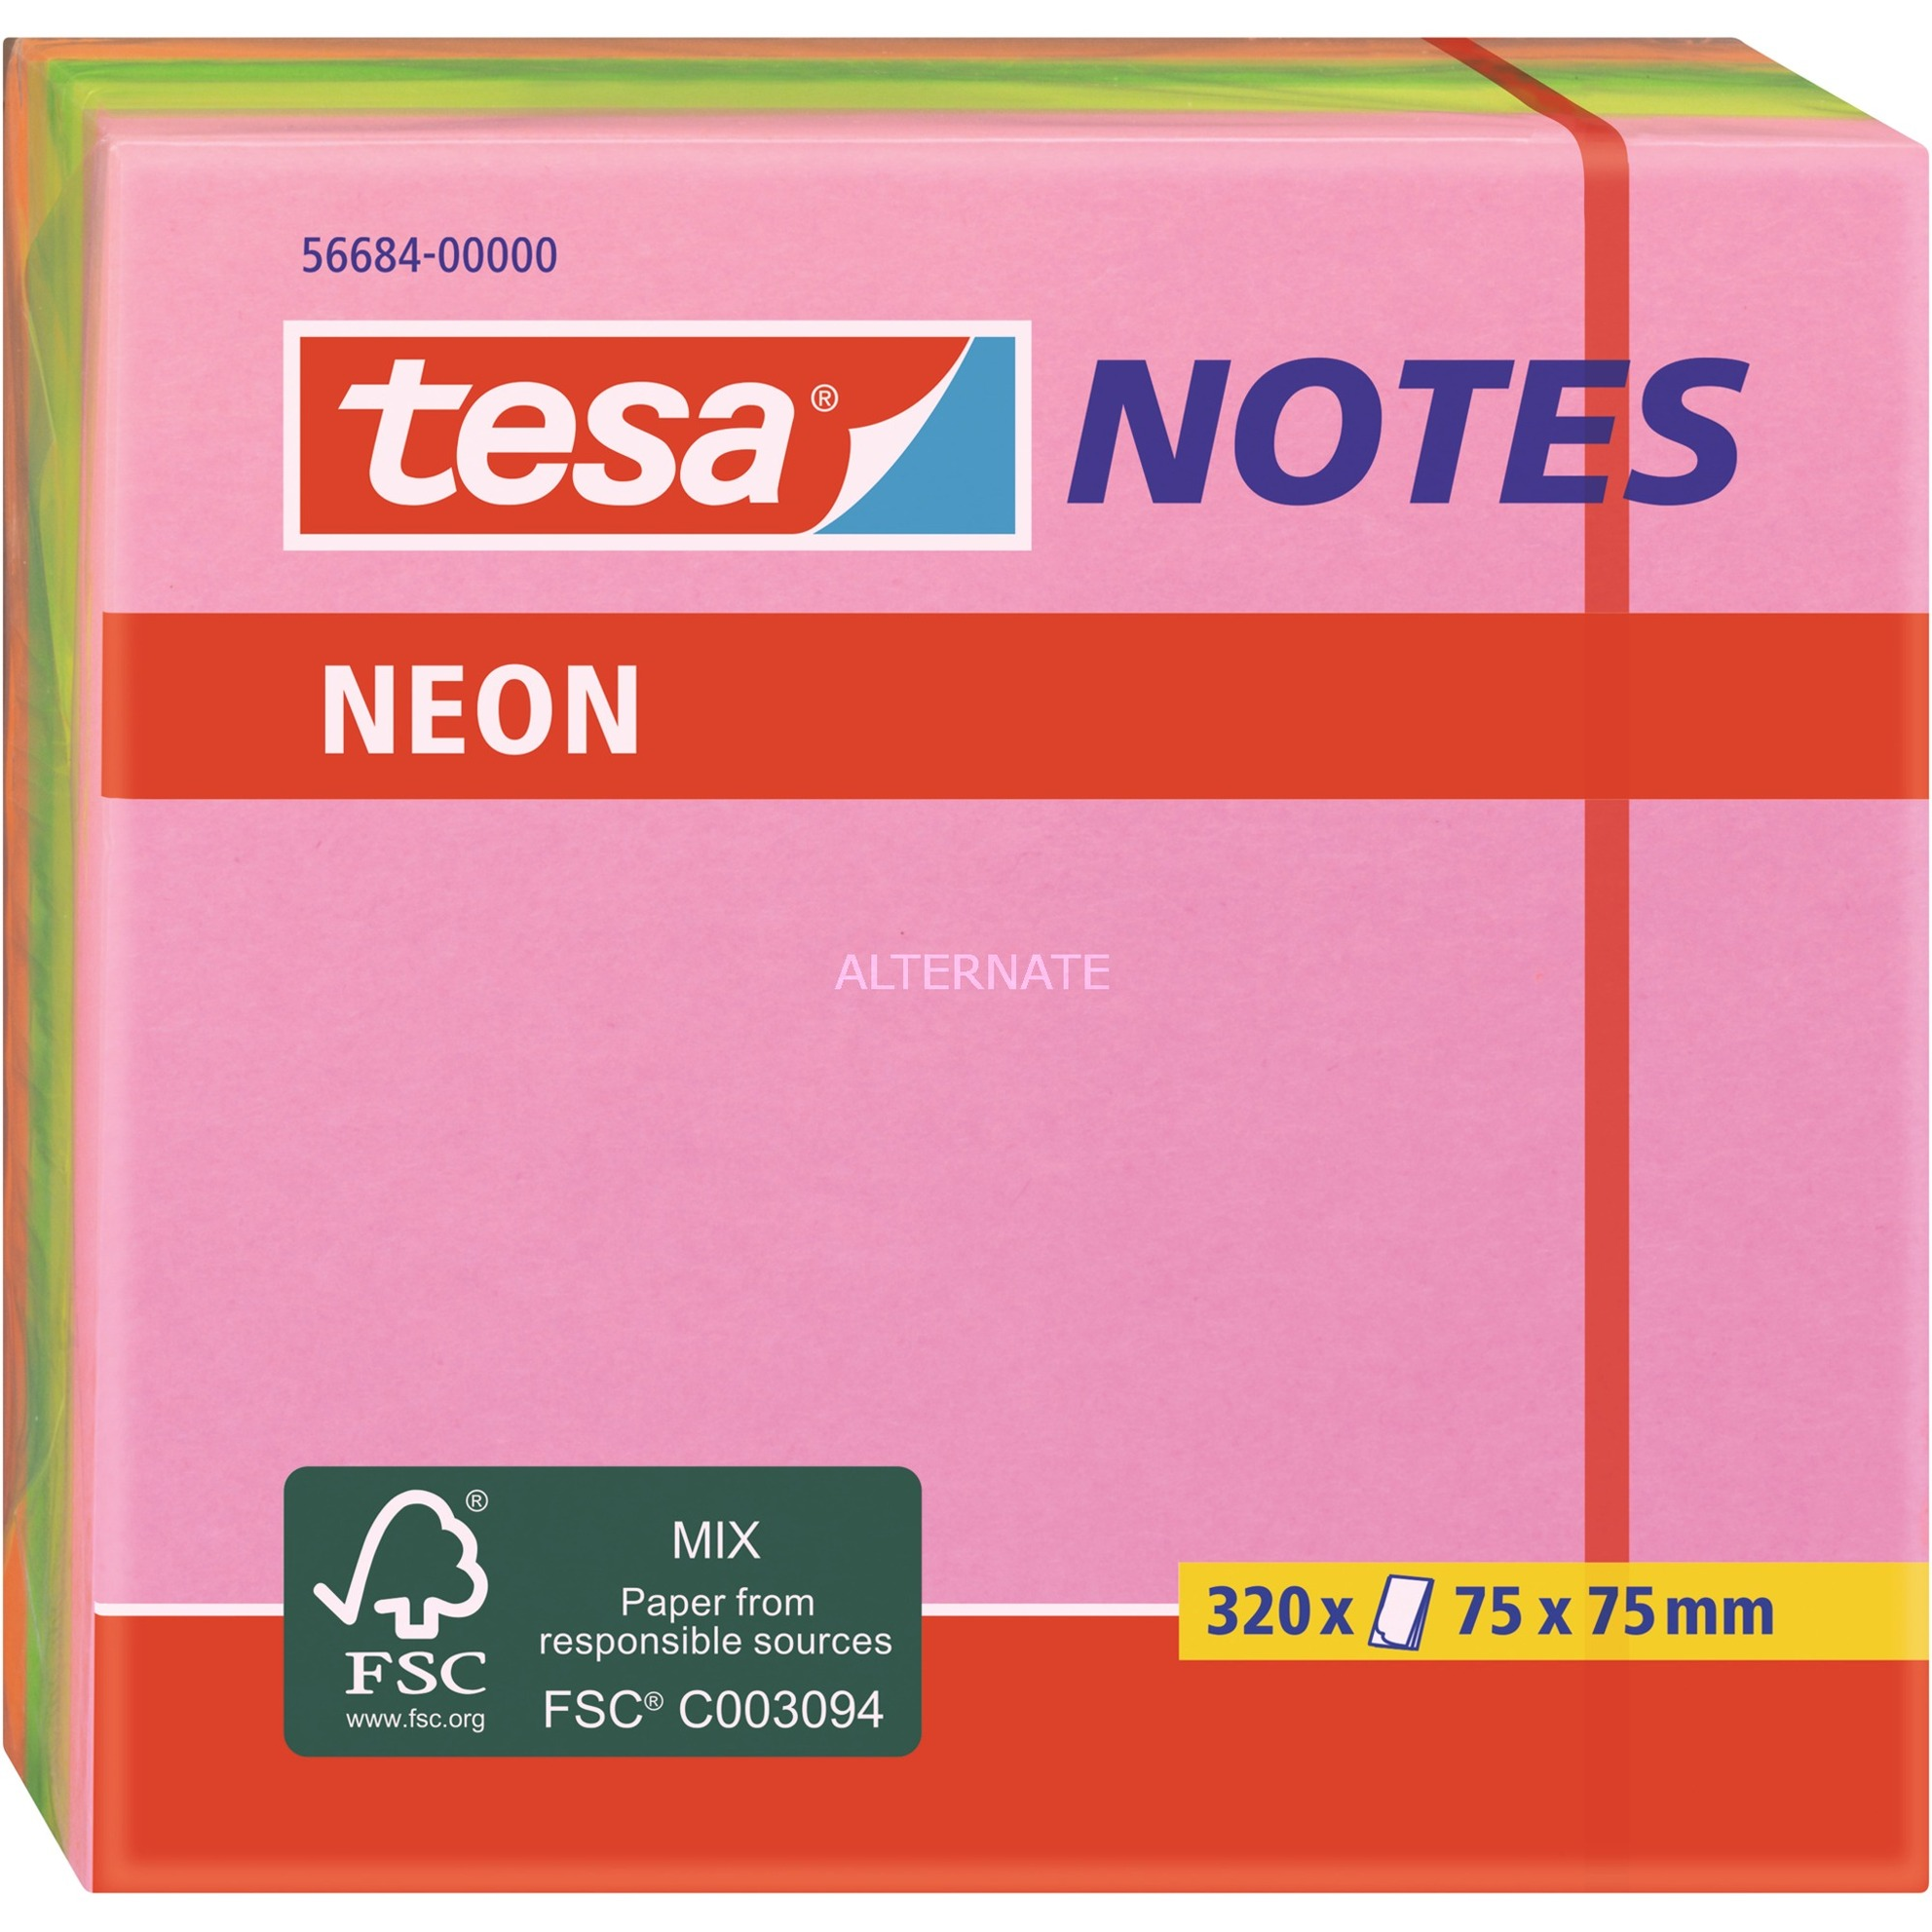 Image of Neon Notes Würfel, 320 Blatt, Aufkleber